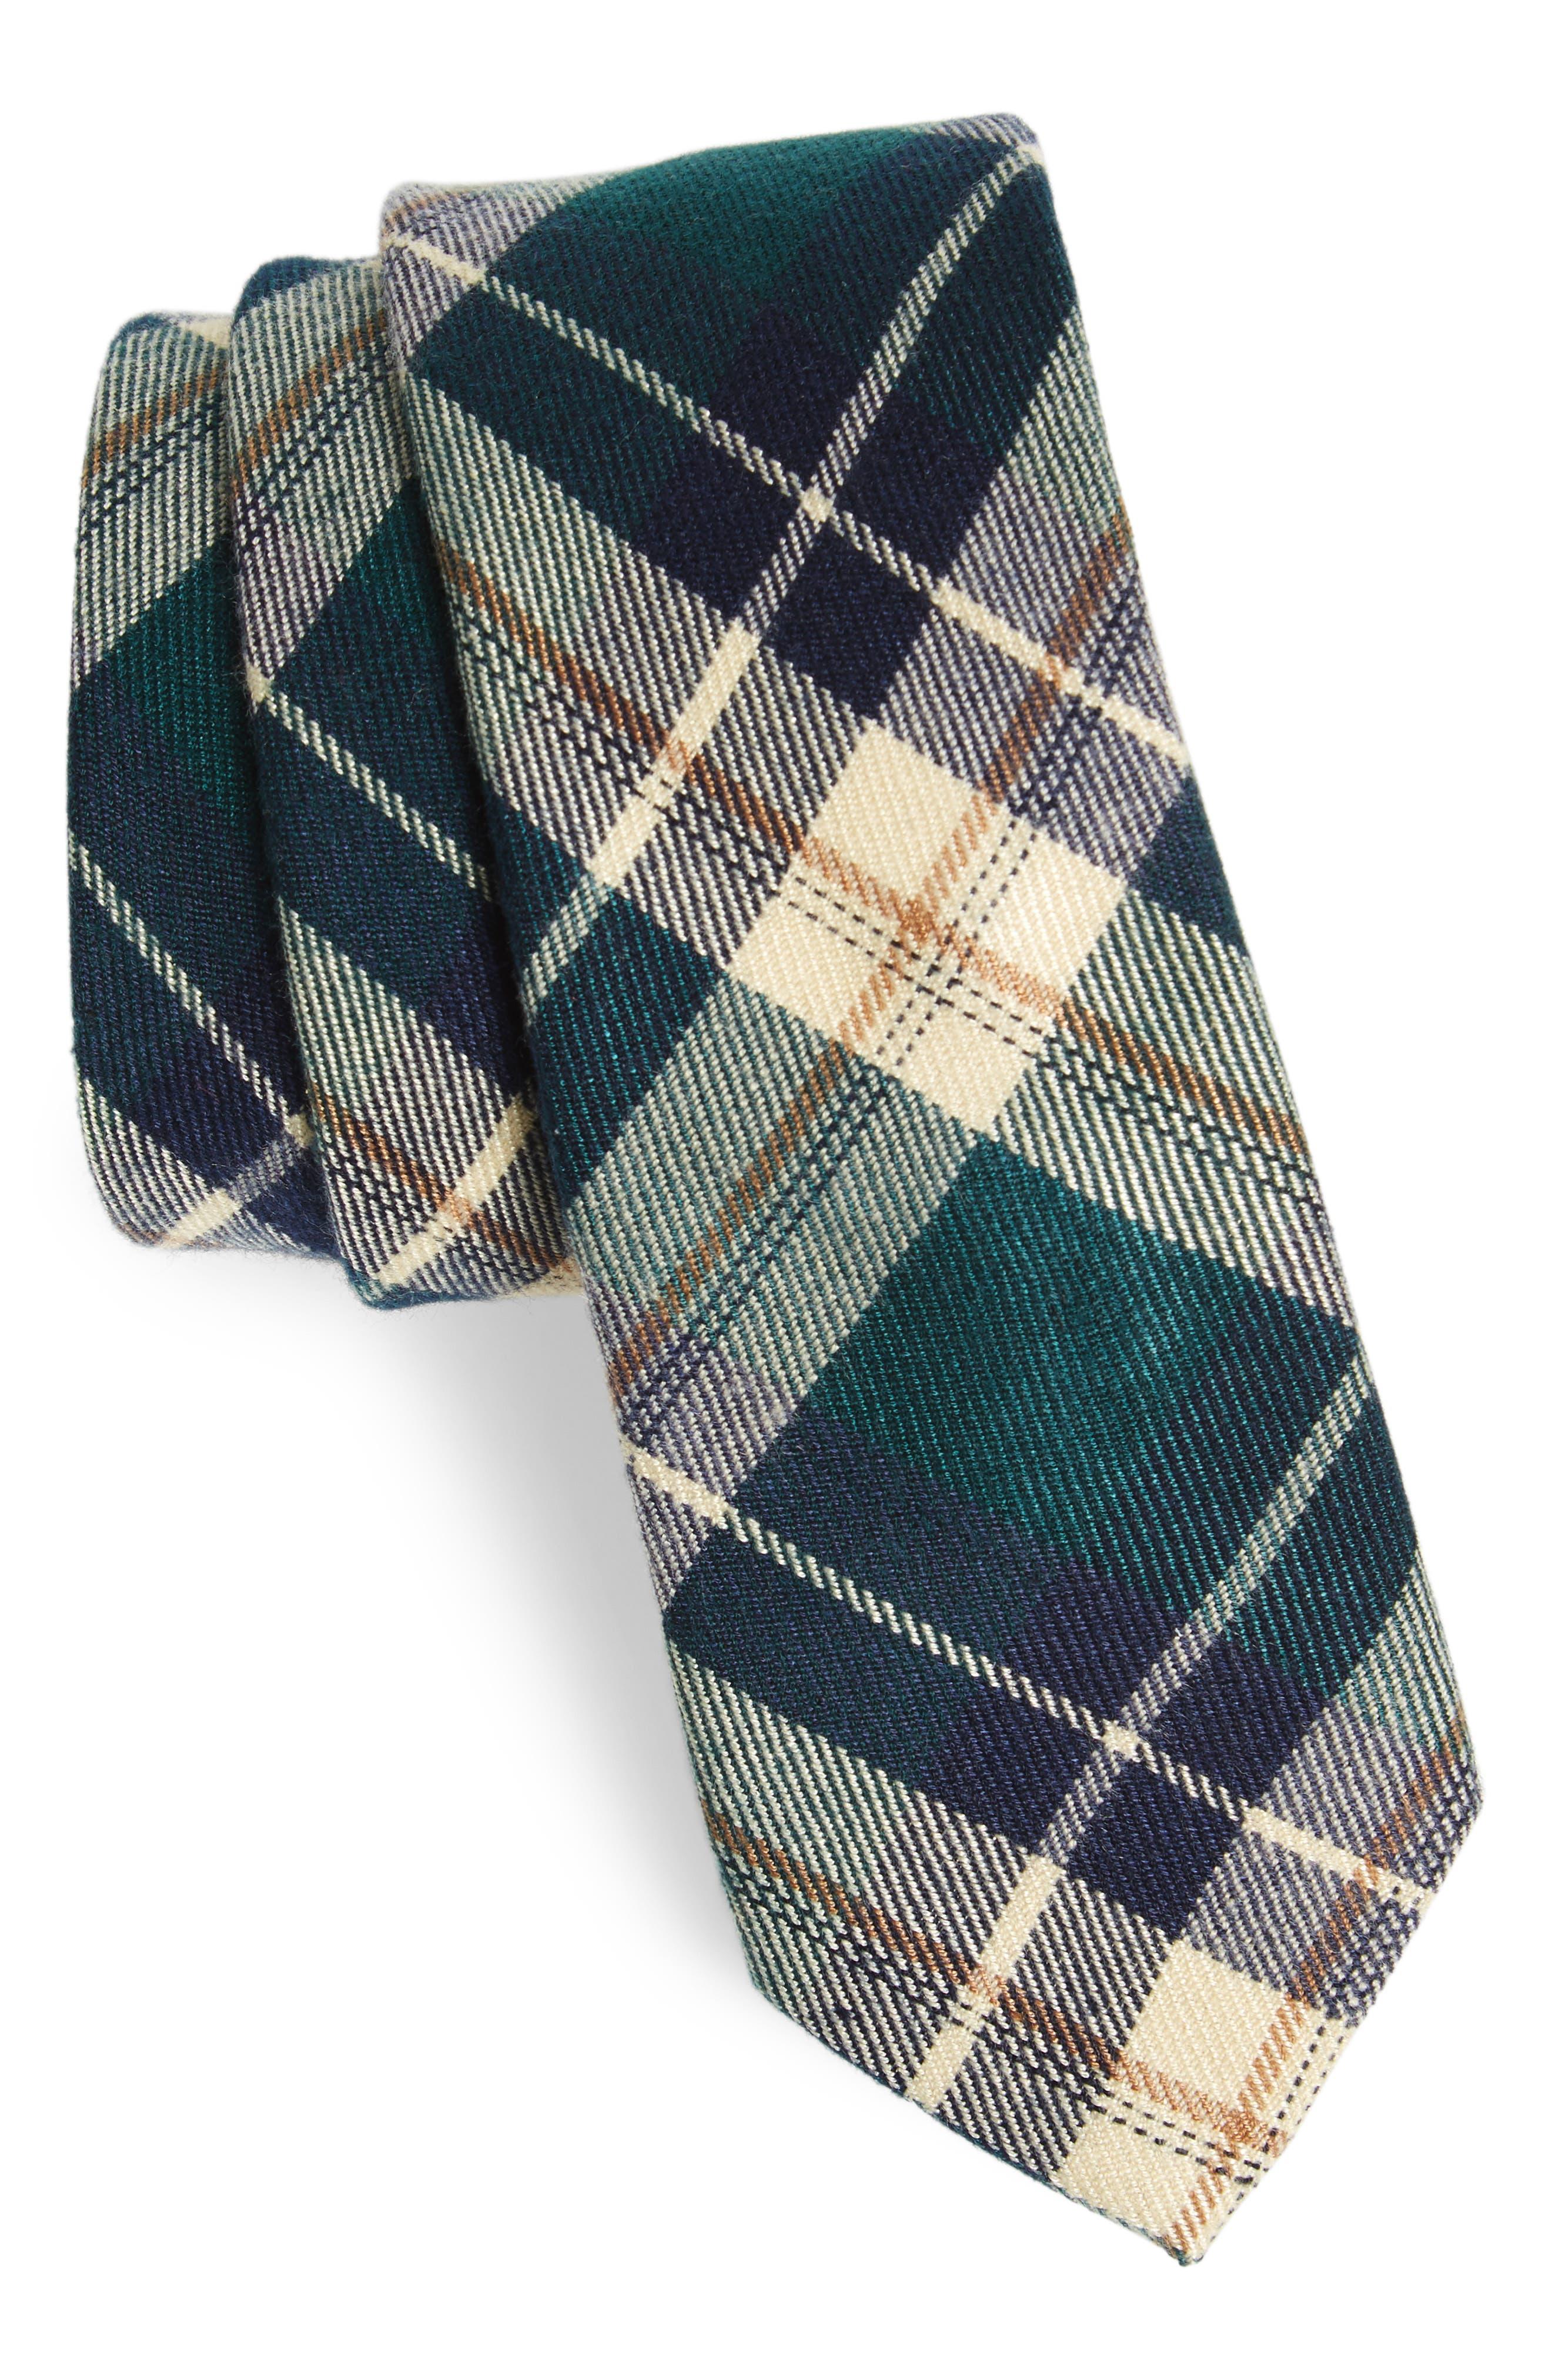 Howerton Plaid Cotton Skinny Tie,                             Main thumbnail 1, color,                             Green